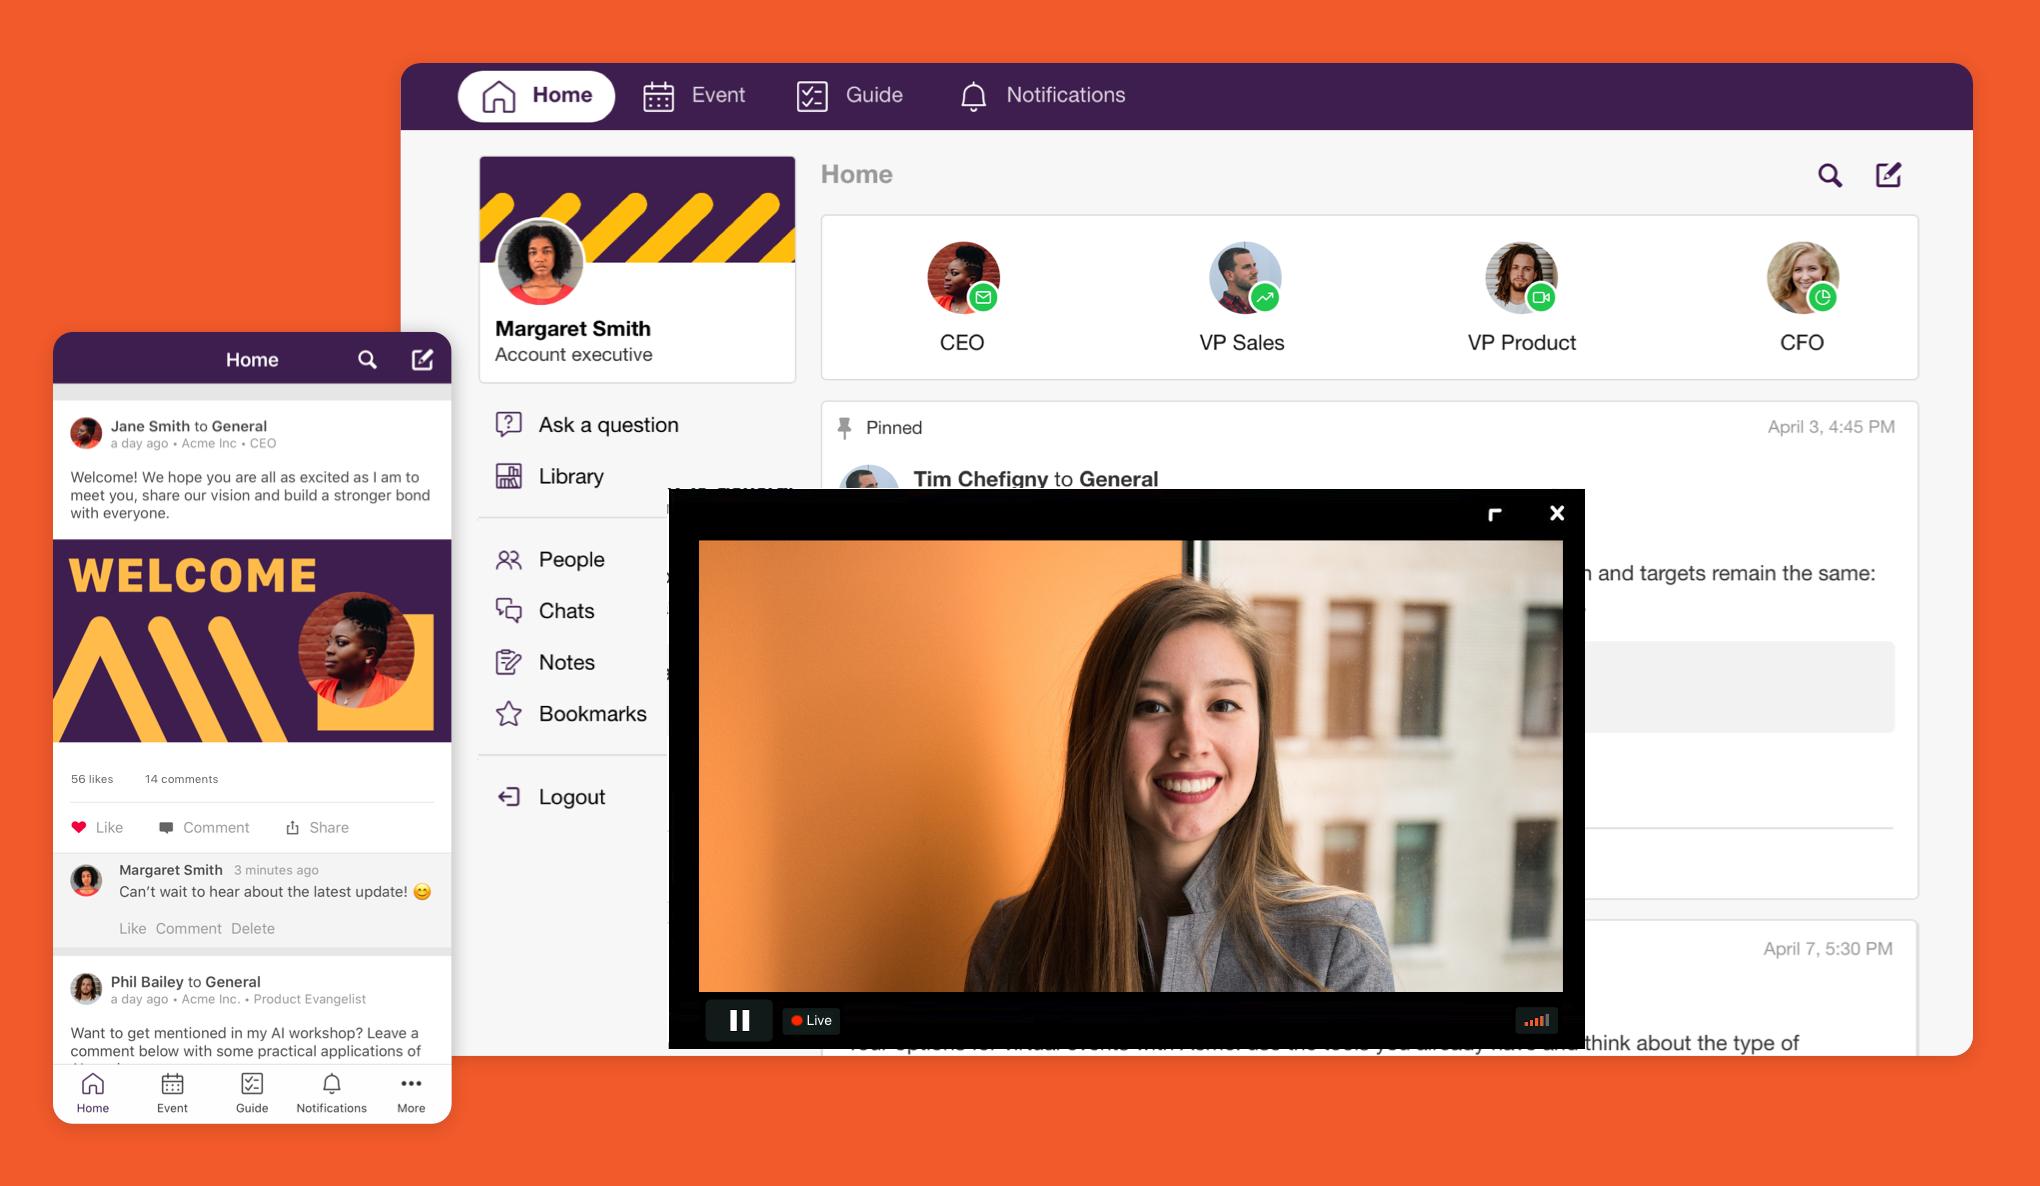 SpotMe virtual event platform